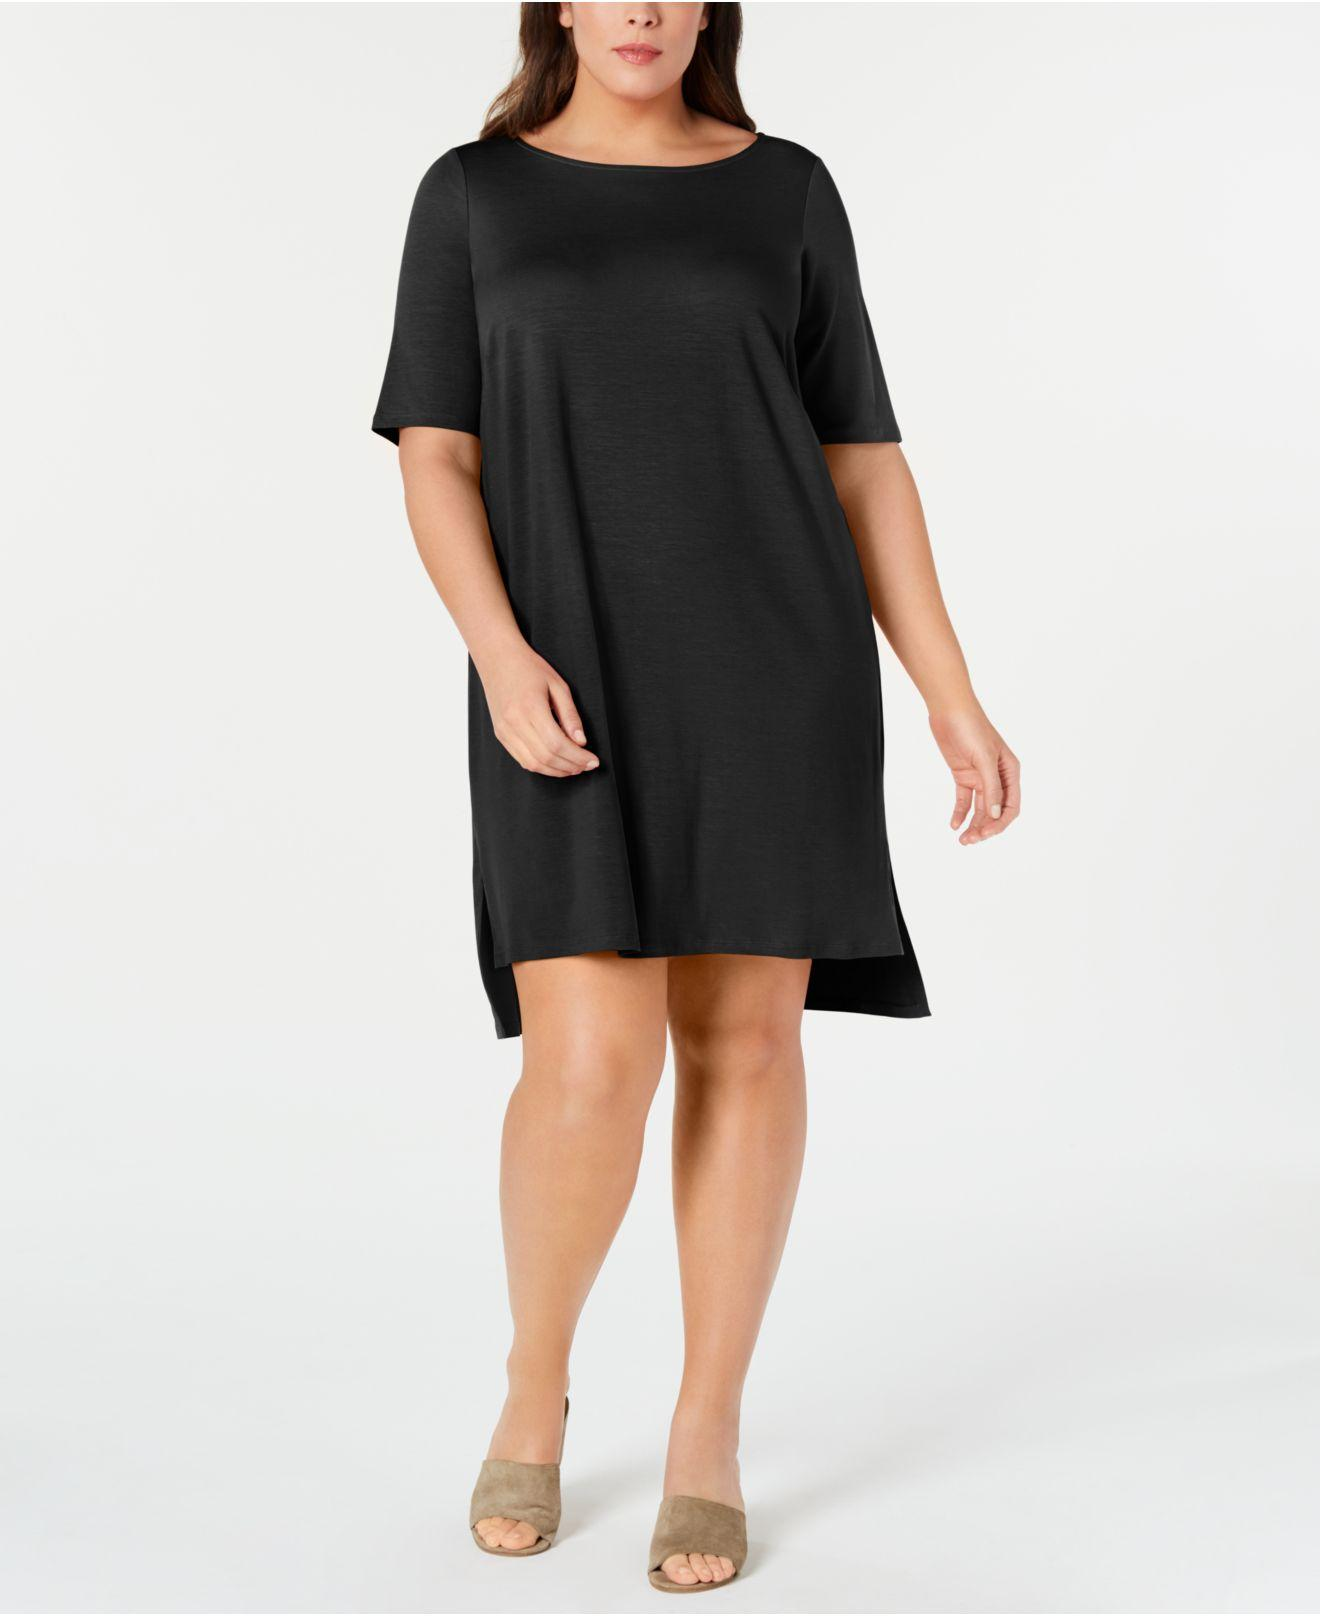 3b45672ff6f Lyst - Eileen Fisher Plus Size Elbow-sleeve High-low Dress in Black